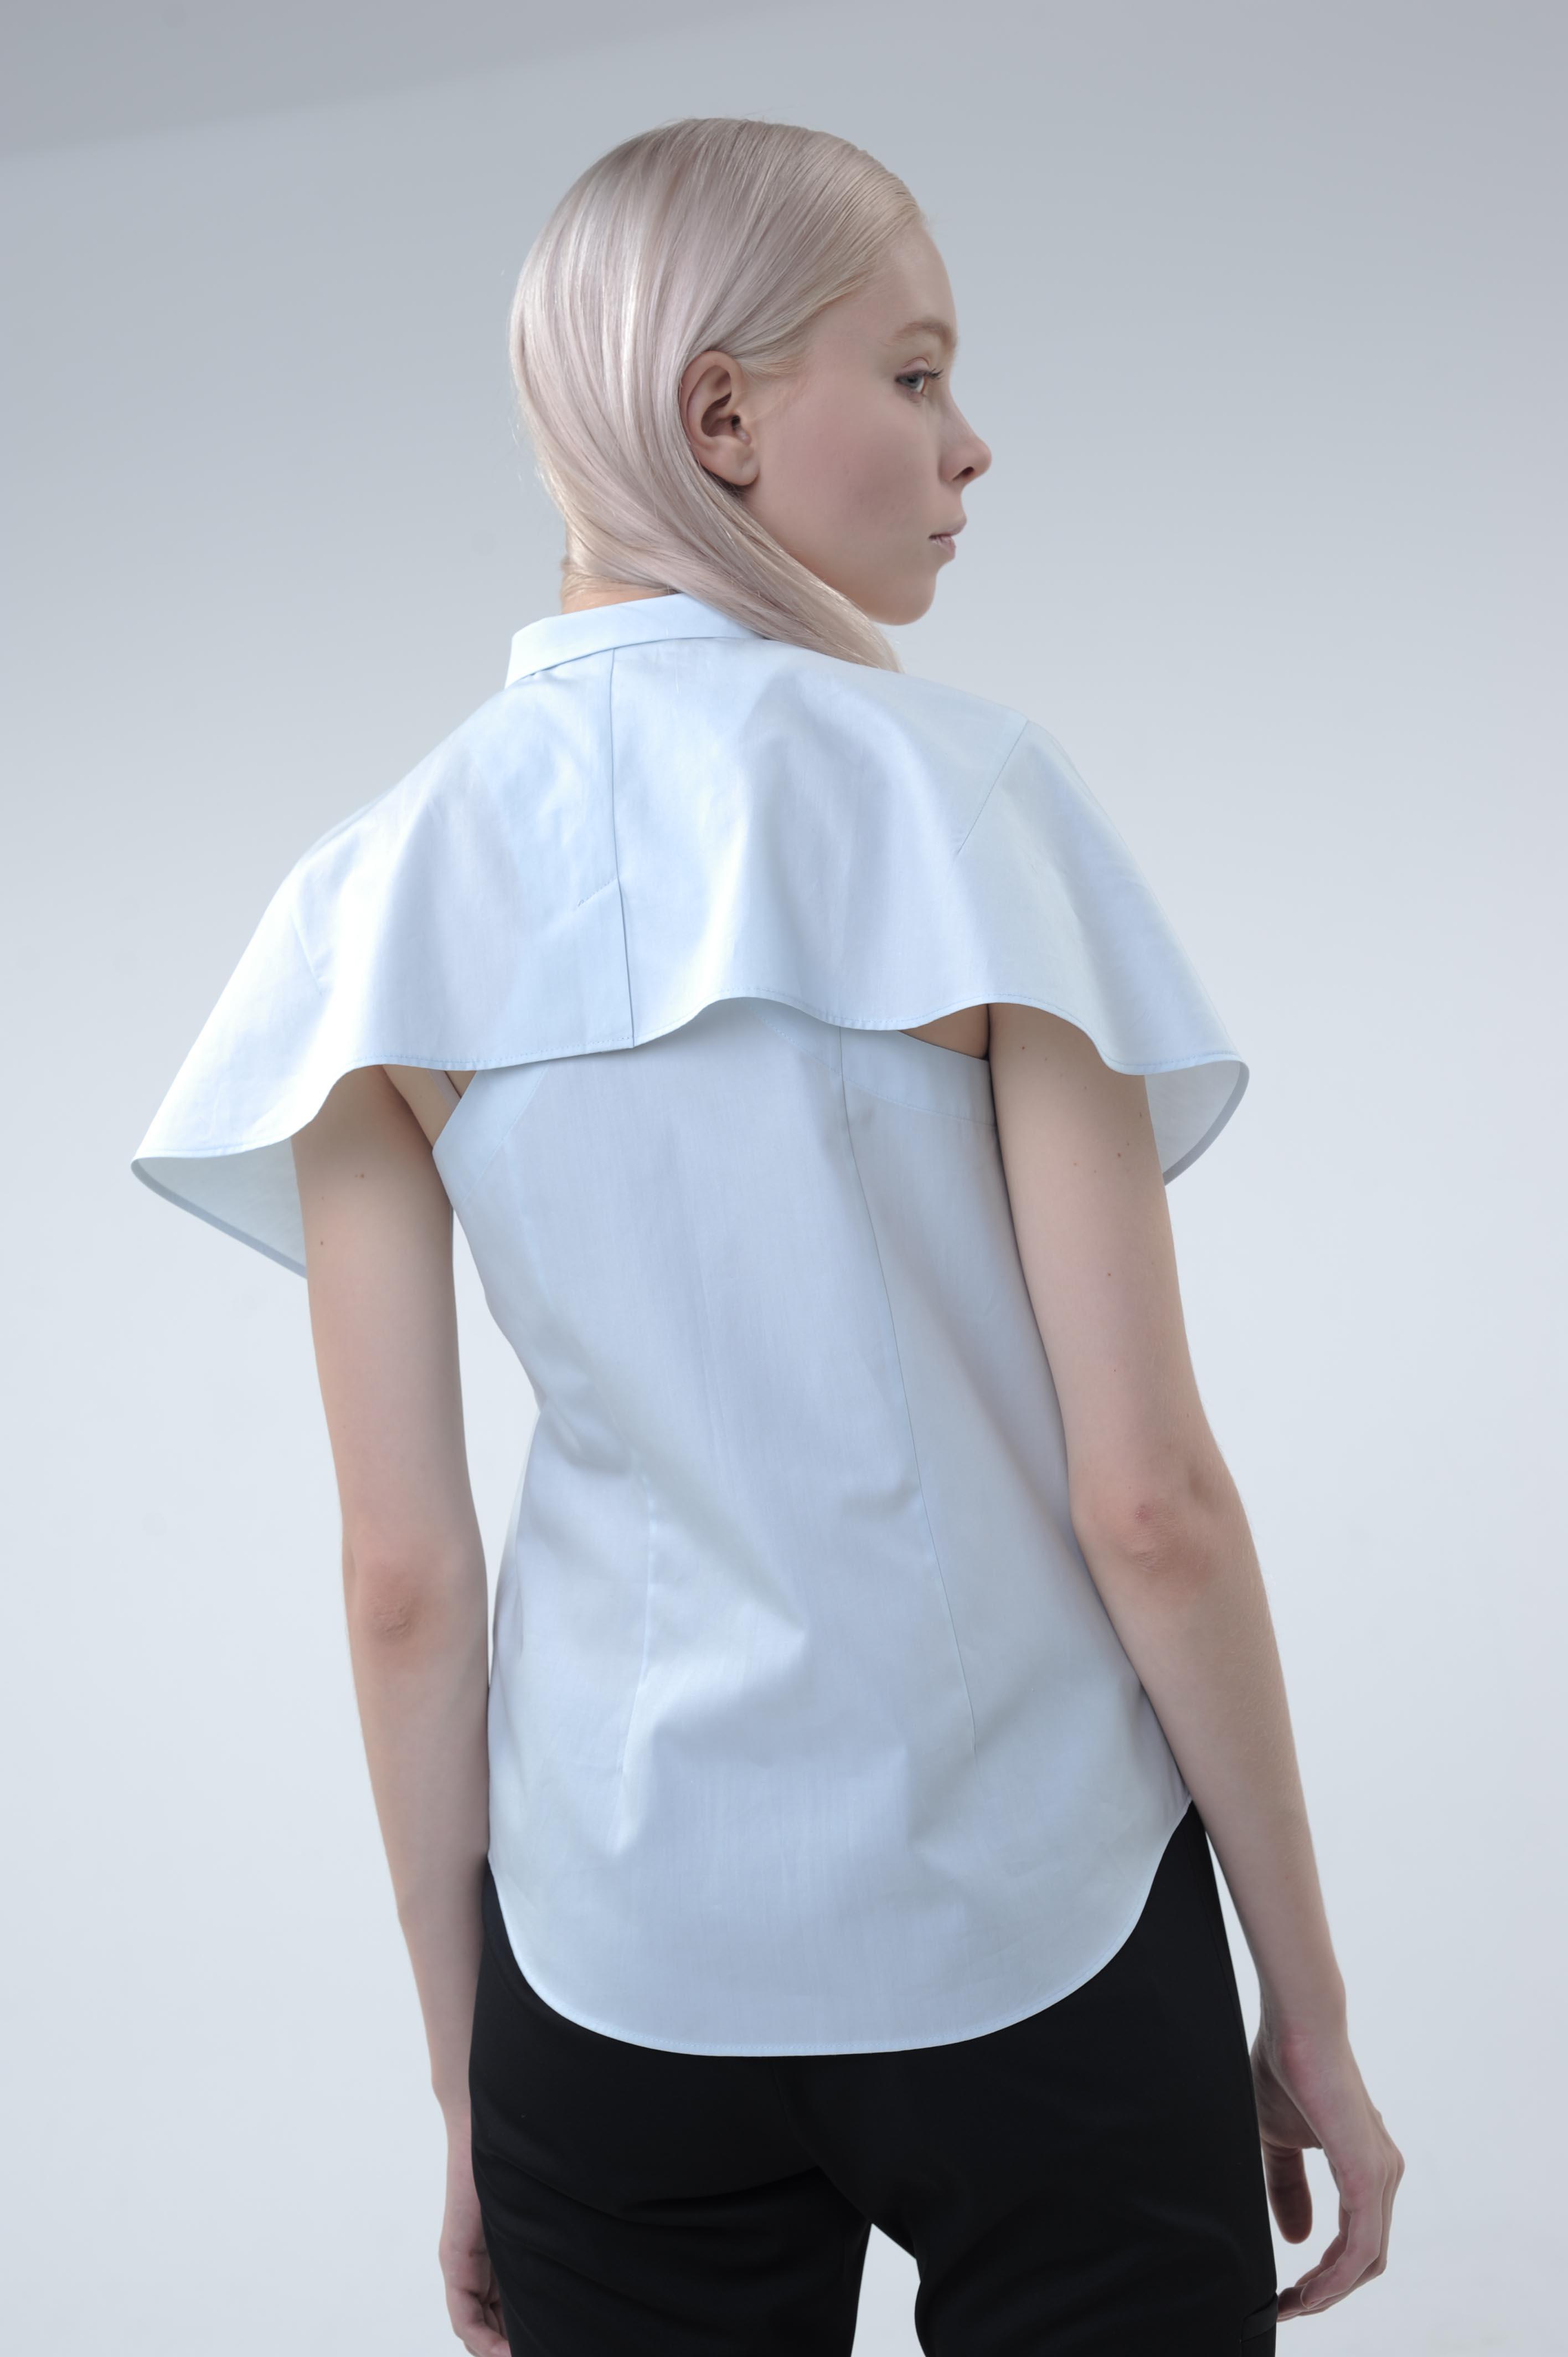 uemulo munenoli ホワイトレーベルのシャツ・ブラウス 『BELL』_e0122680_183829.jpg